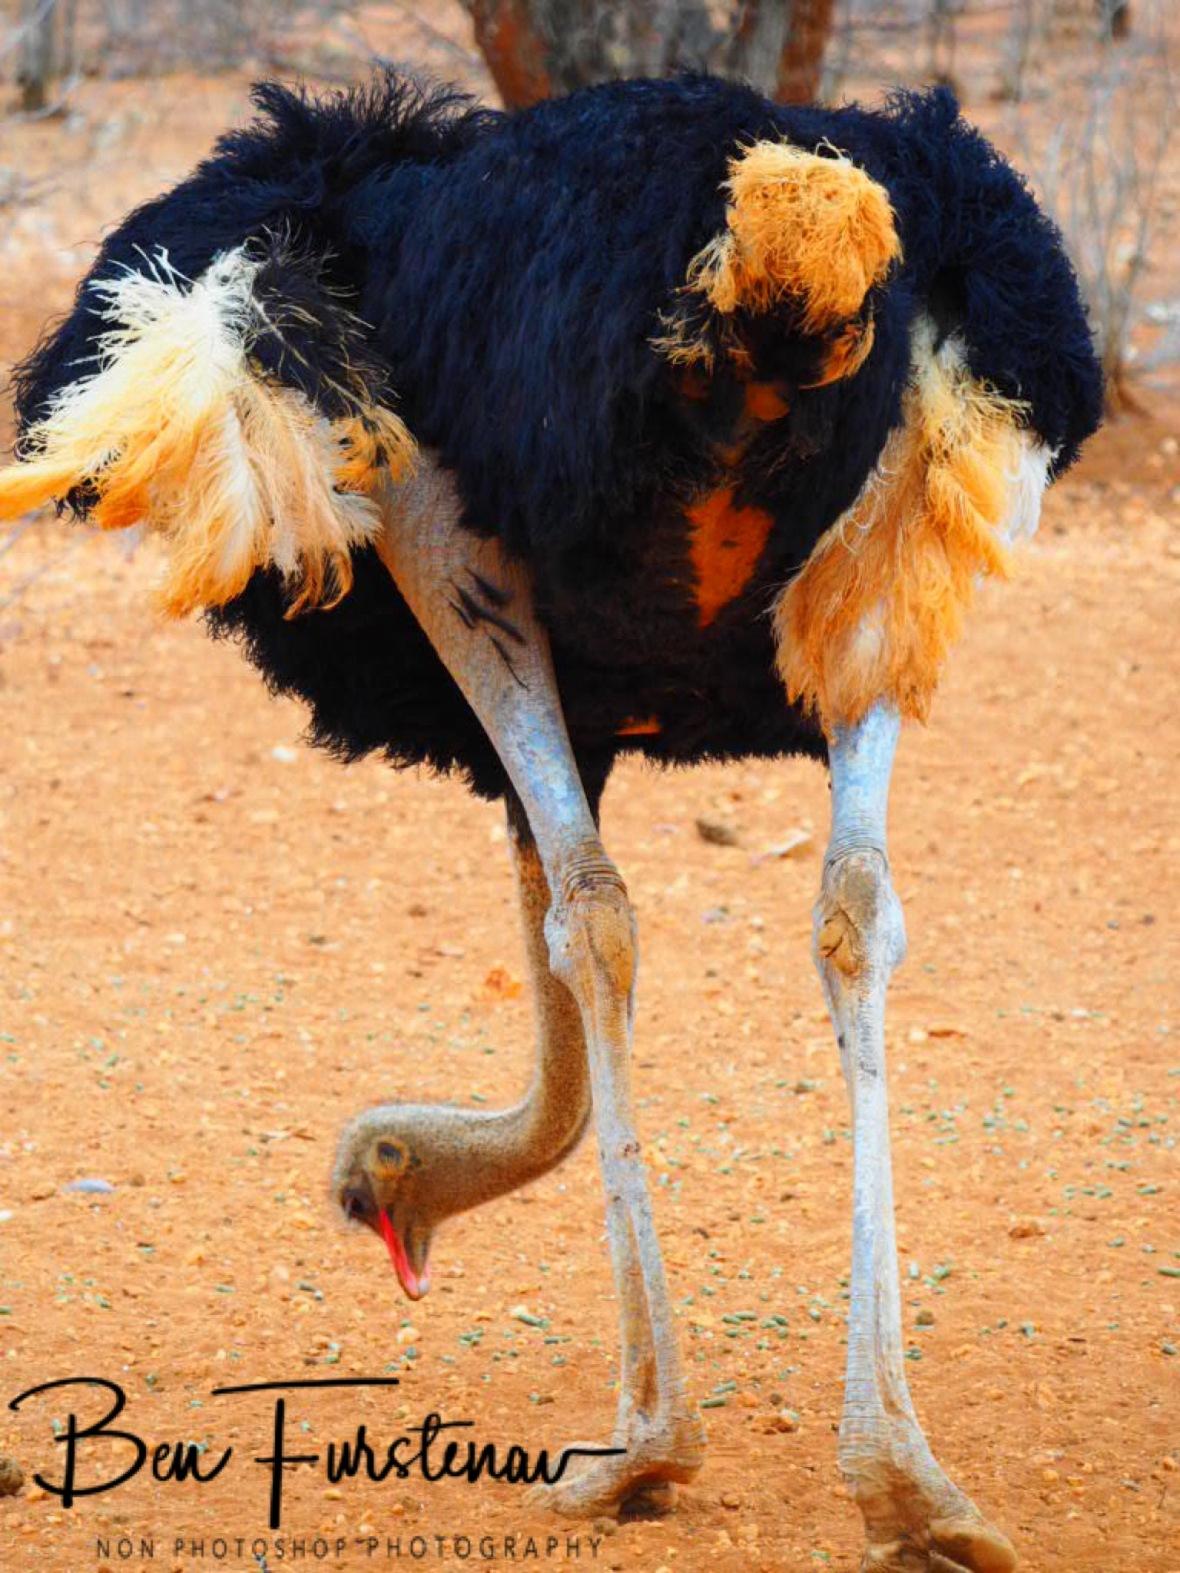 Oversized chicken, Outjo, Sophienhof, Namibia